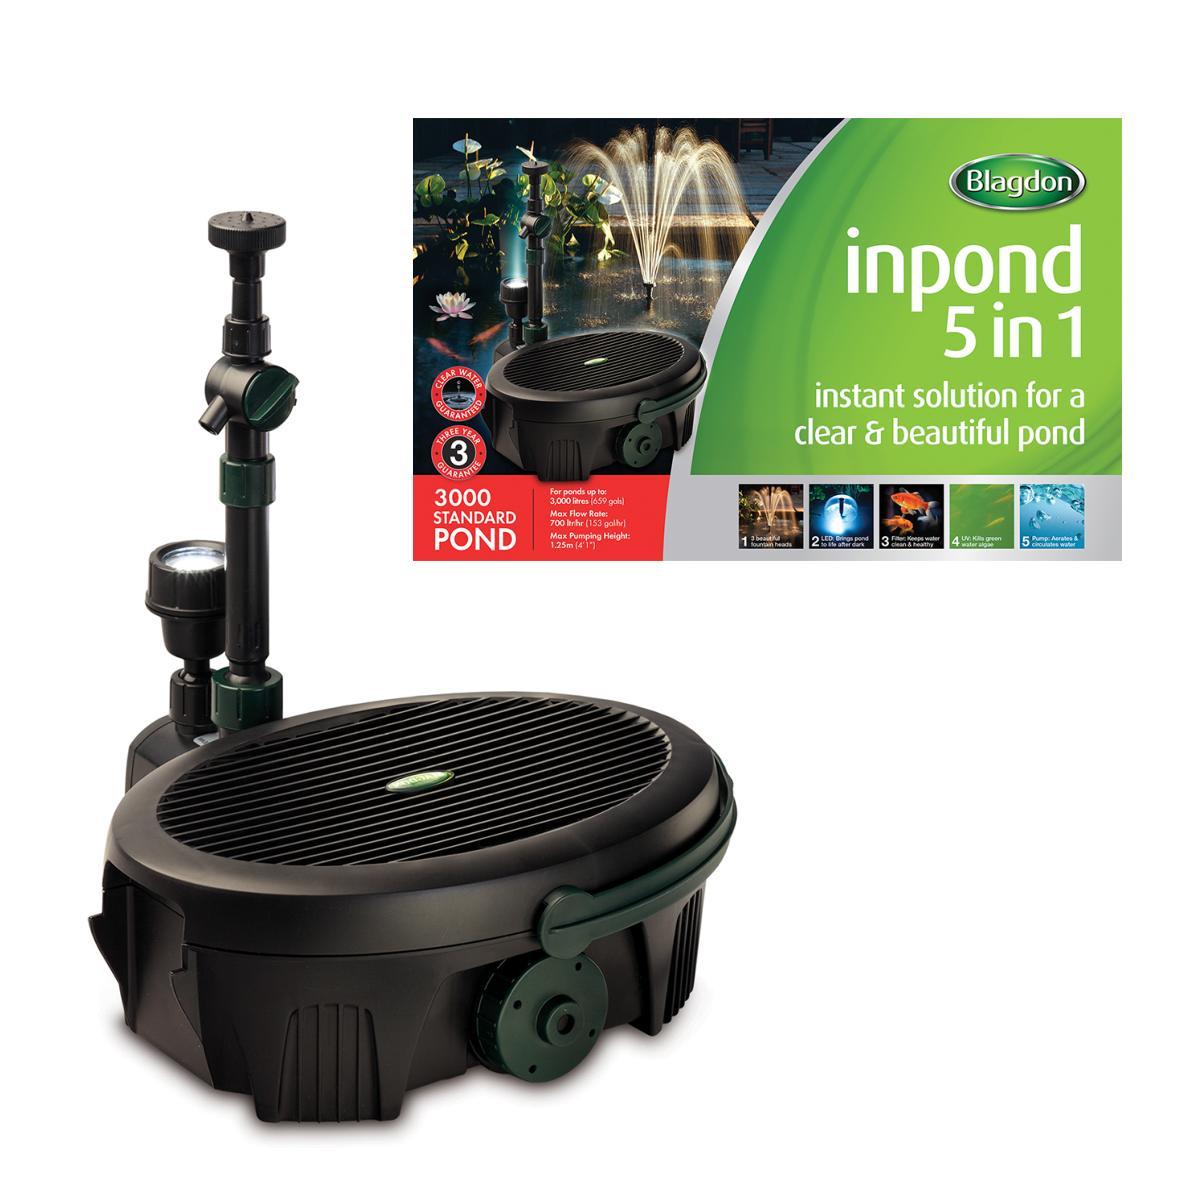 Blagdon Inpond 5 in 1 Filtration Kit 3000